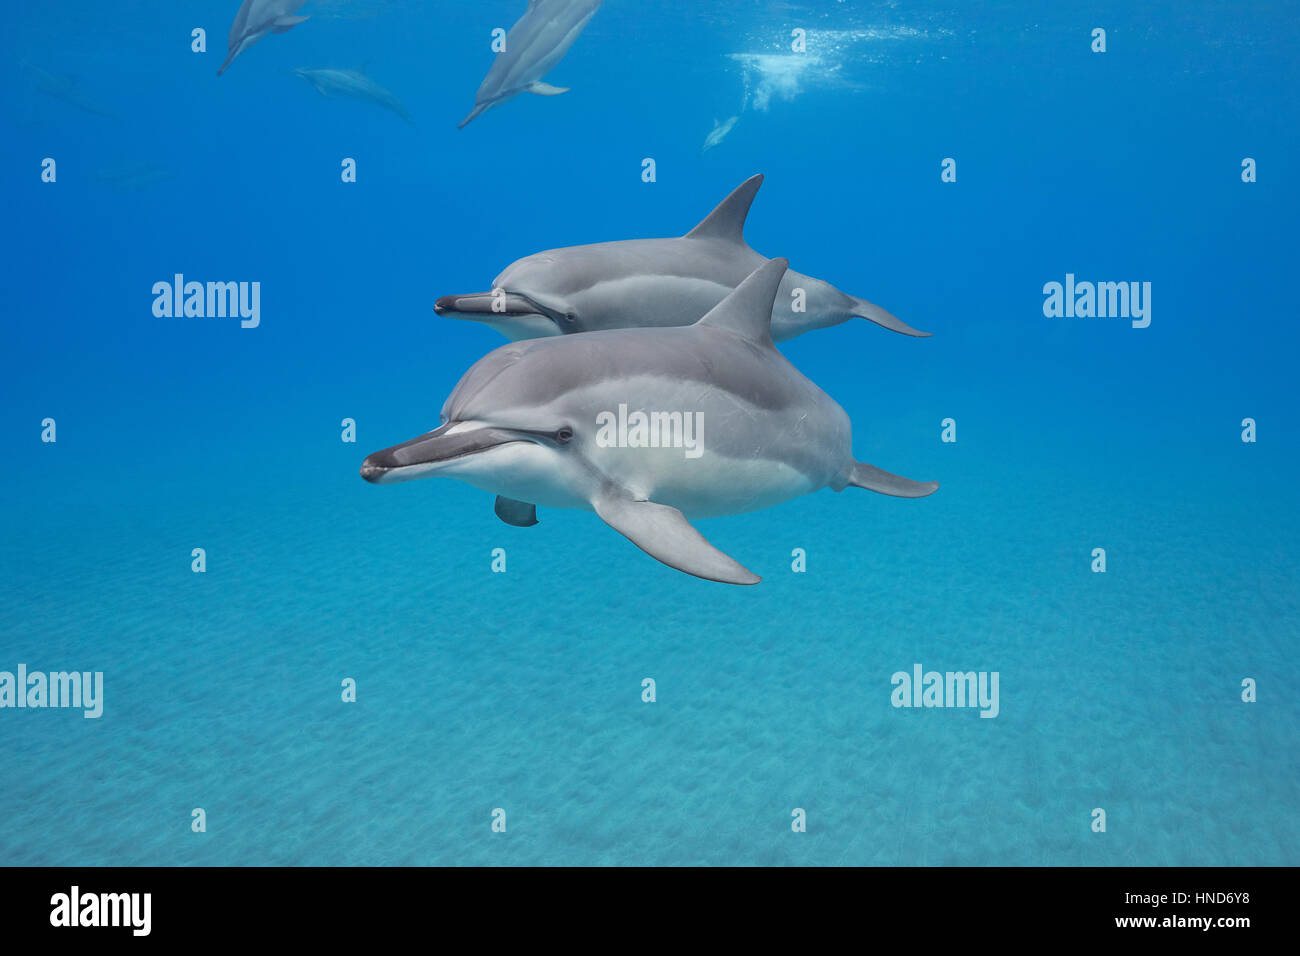 Hawaiian spinner dolphins or Gray's spinner dolphin, Stenella longirostris longirostris, Ho'okena Beach, South Kona, Hawaii ( the Big Island ), USA Stock Photo